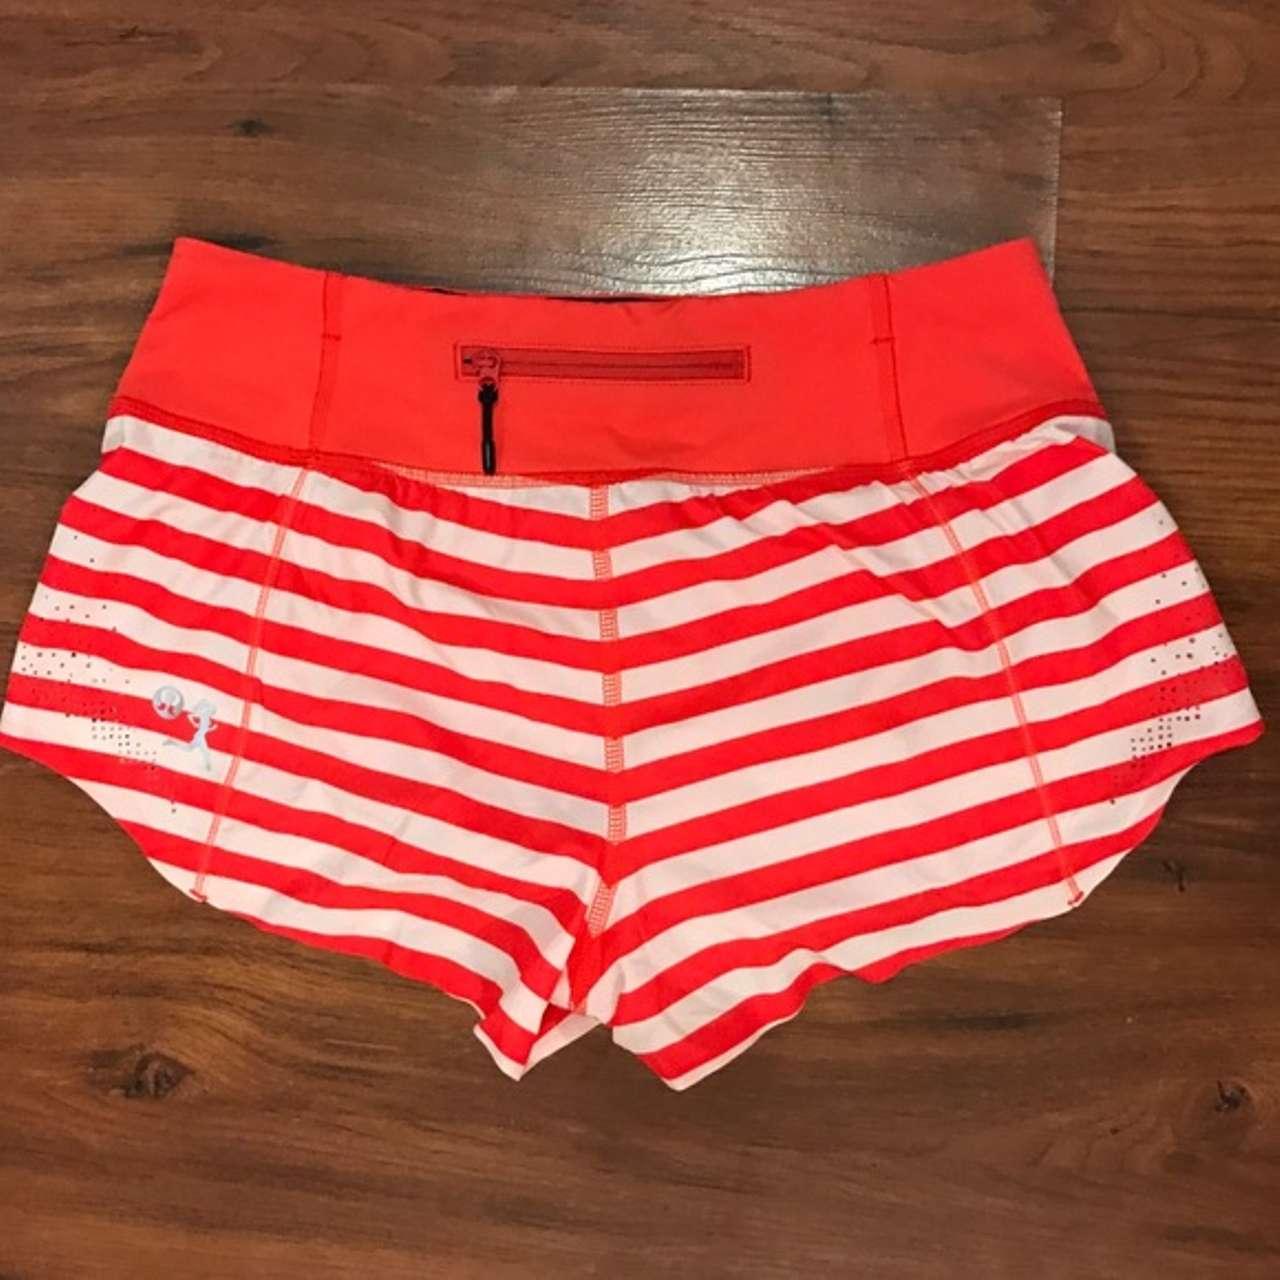 Lululemon Run: Light As Air Short - 2012 Seawheeze - Fearless Red Waldo Stripe